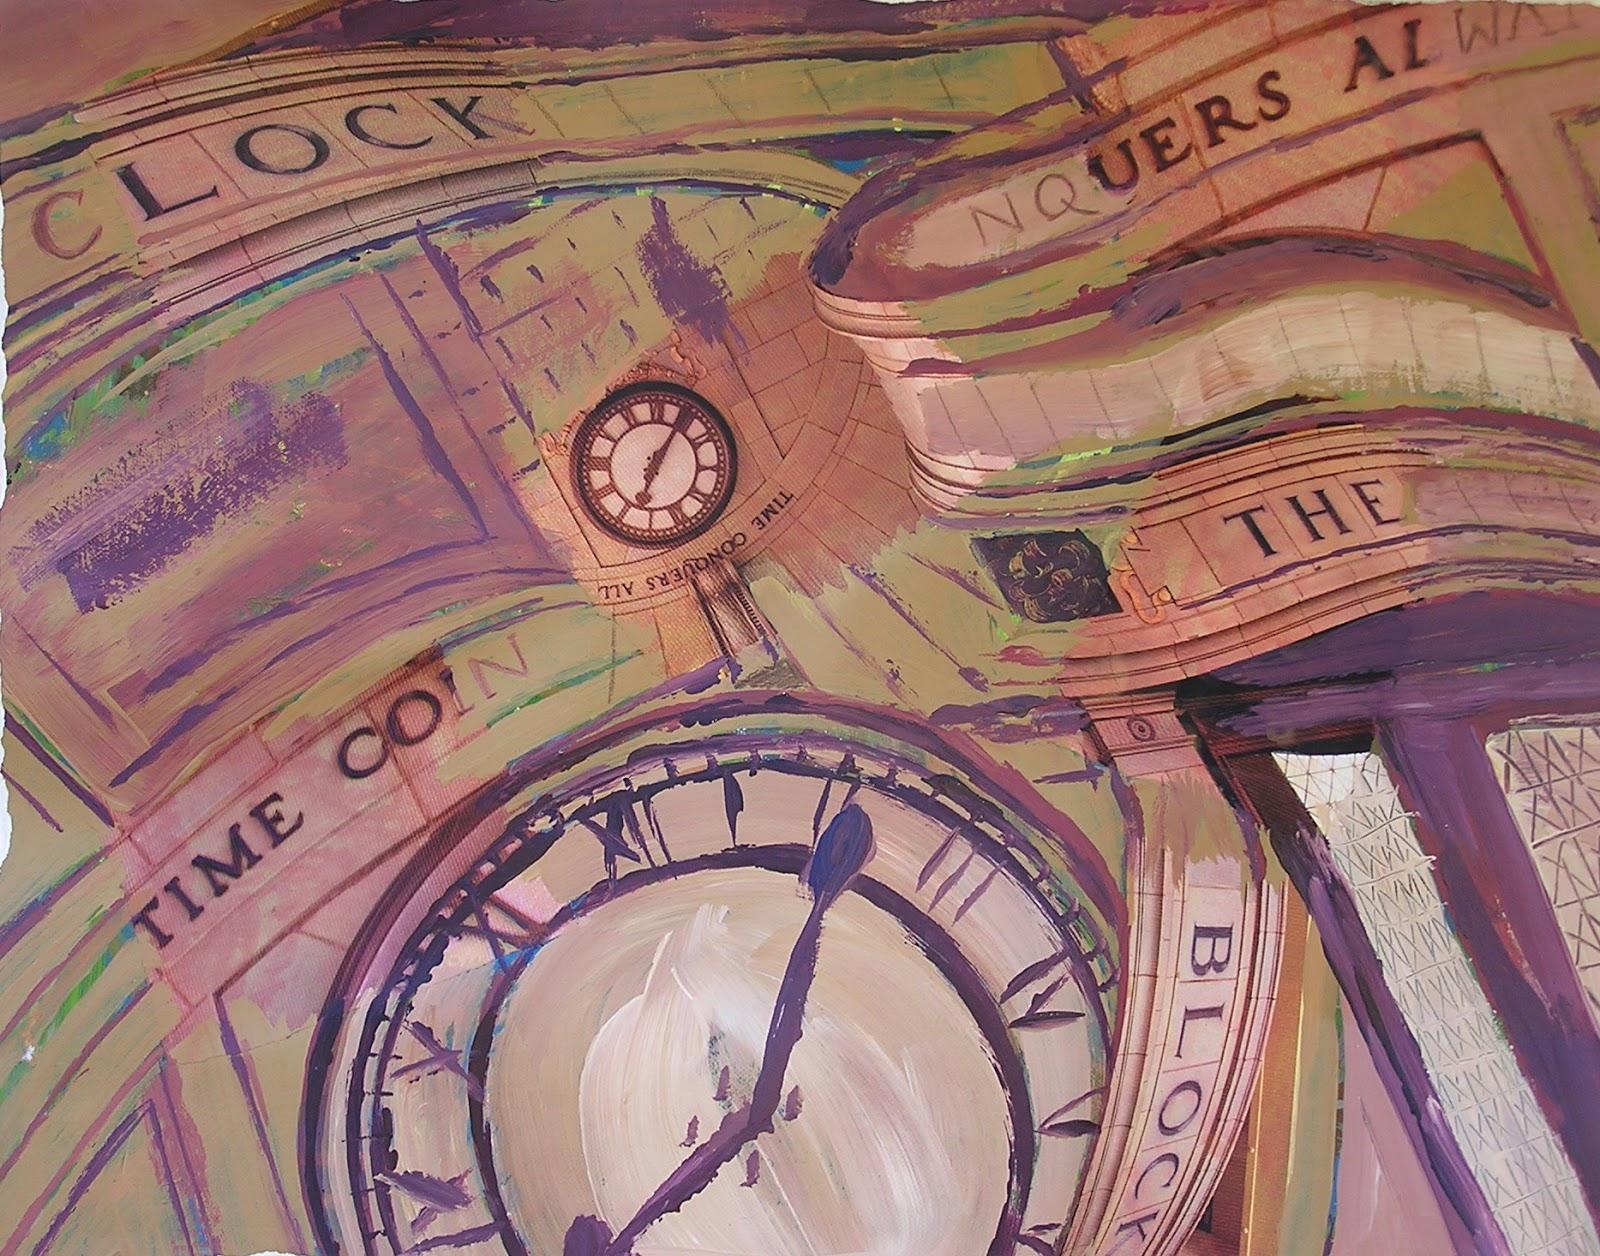 Dymocks Clock